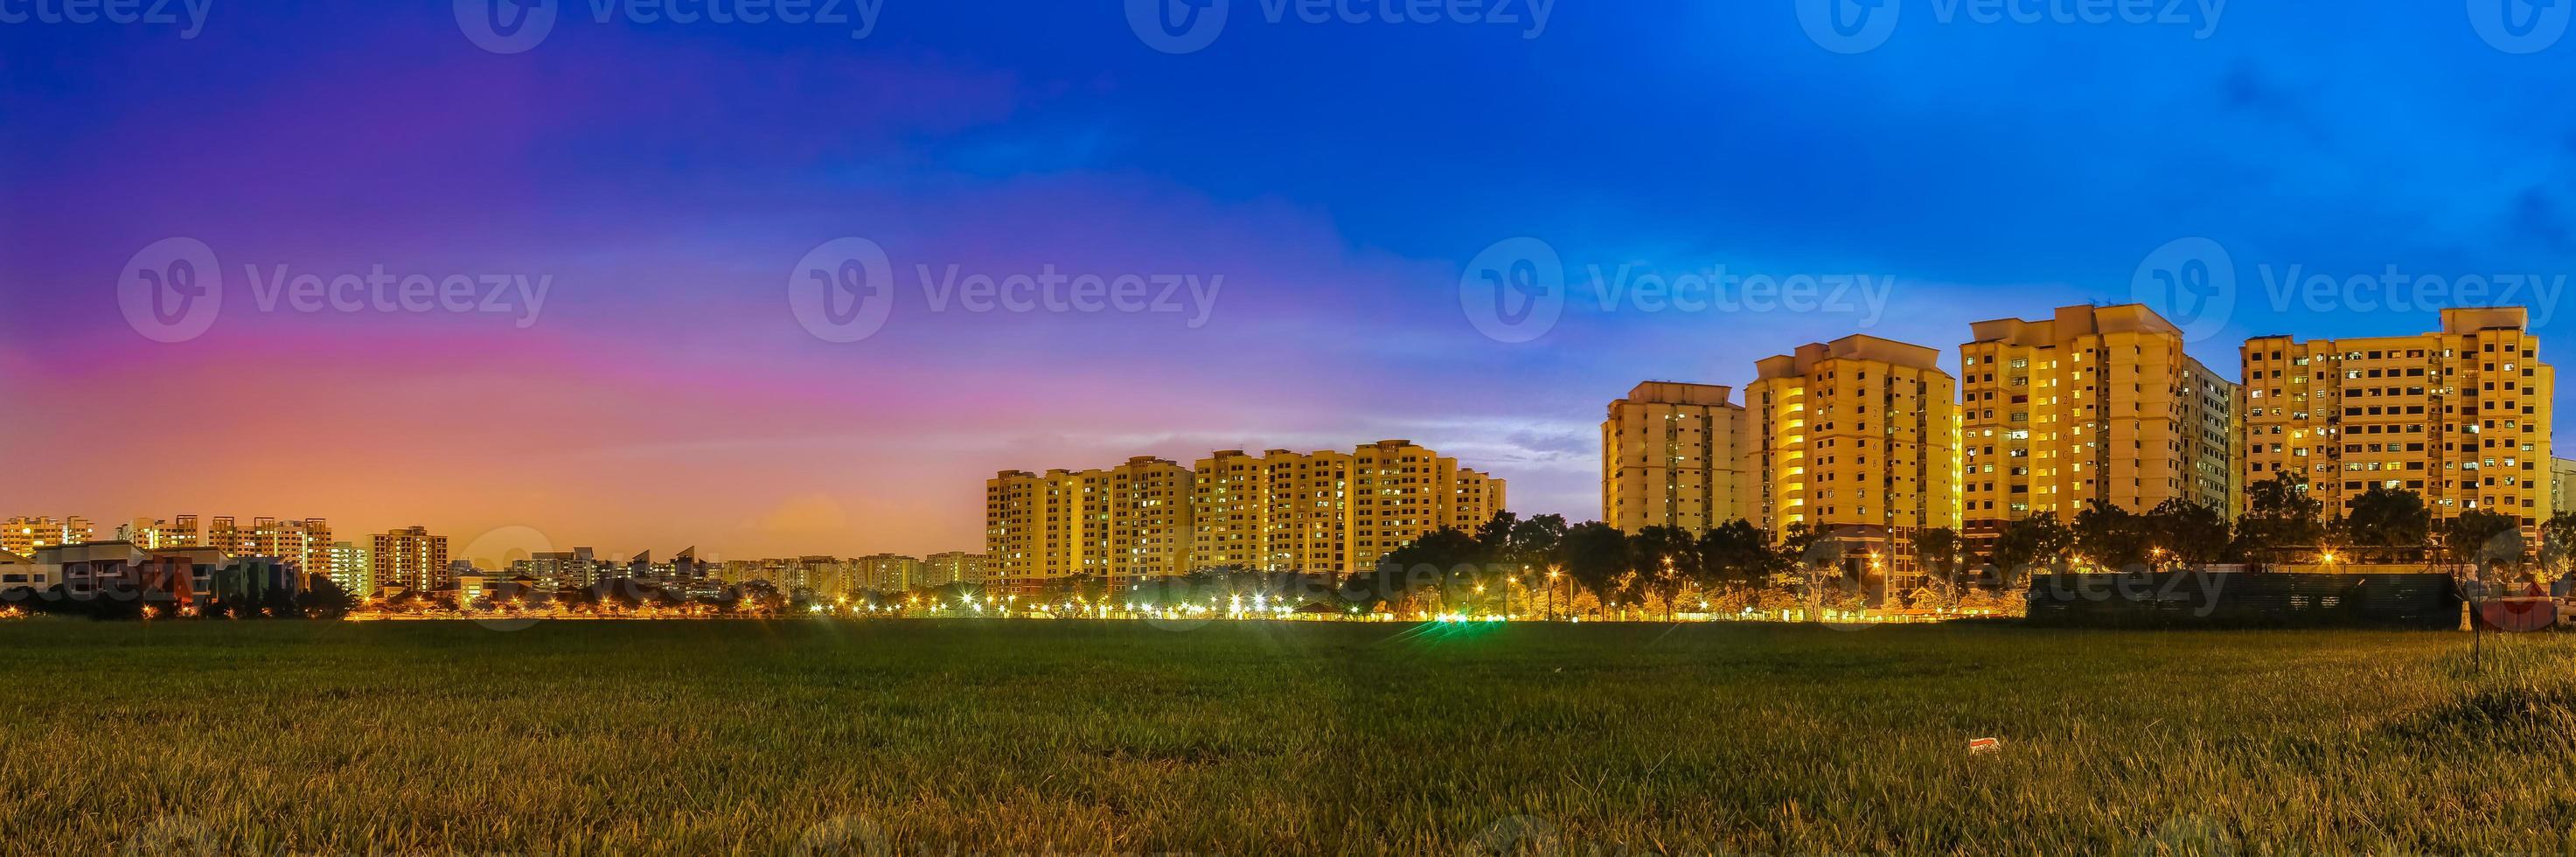 Twilight Singapore foto